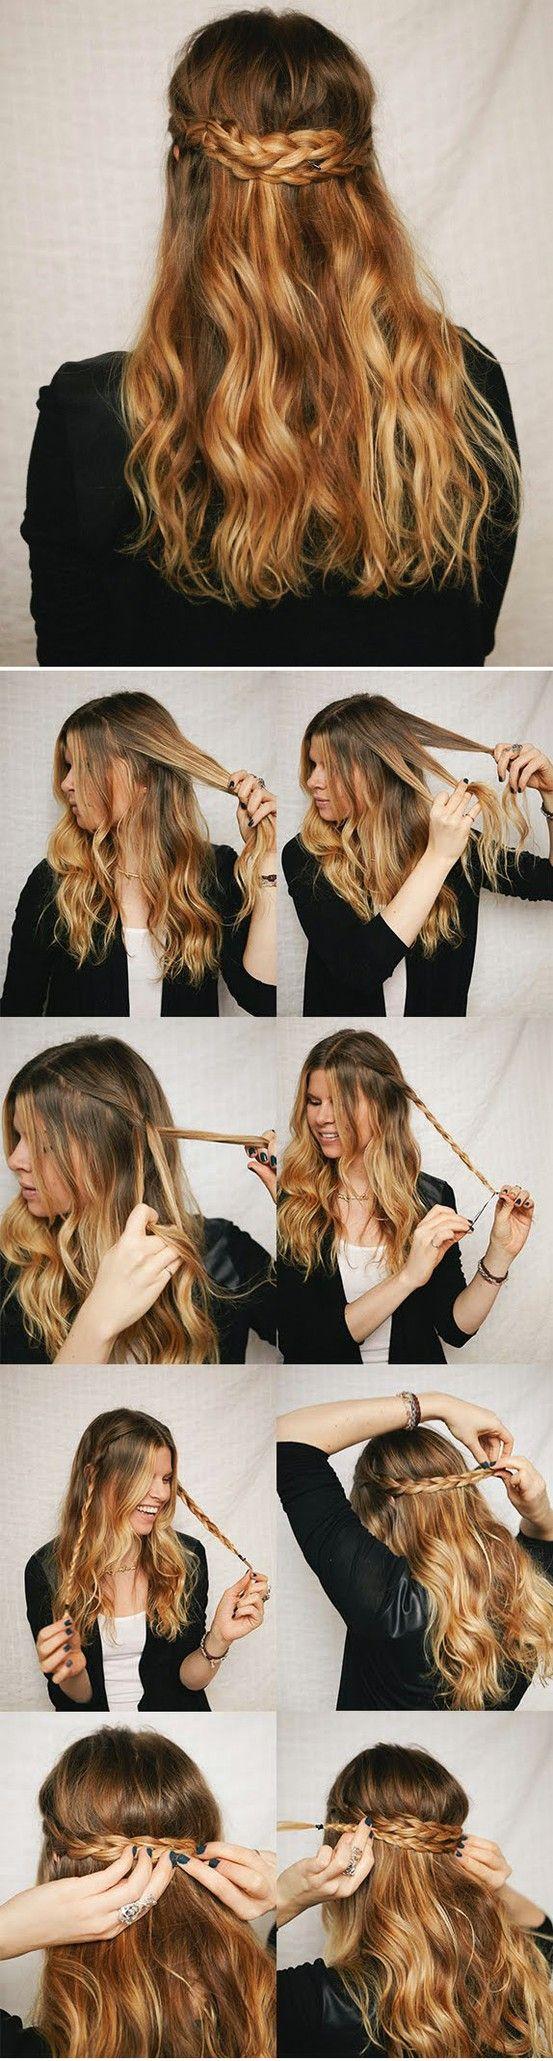 half up-do: braids